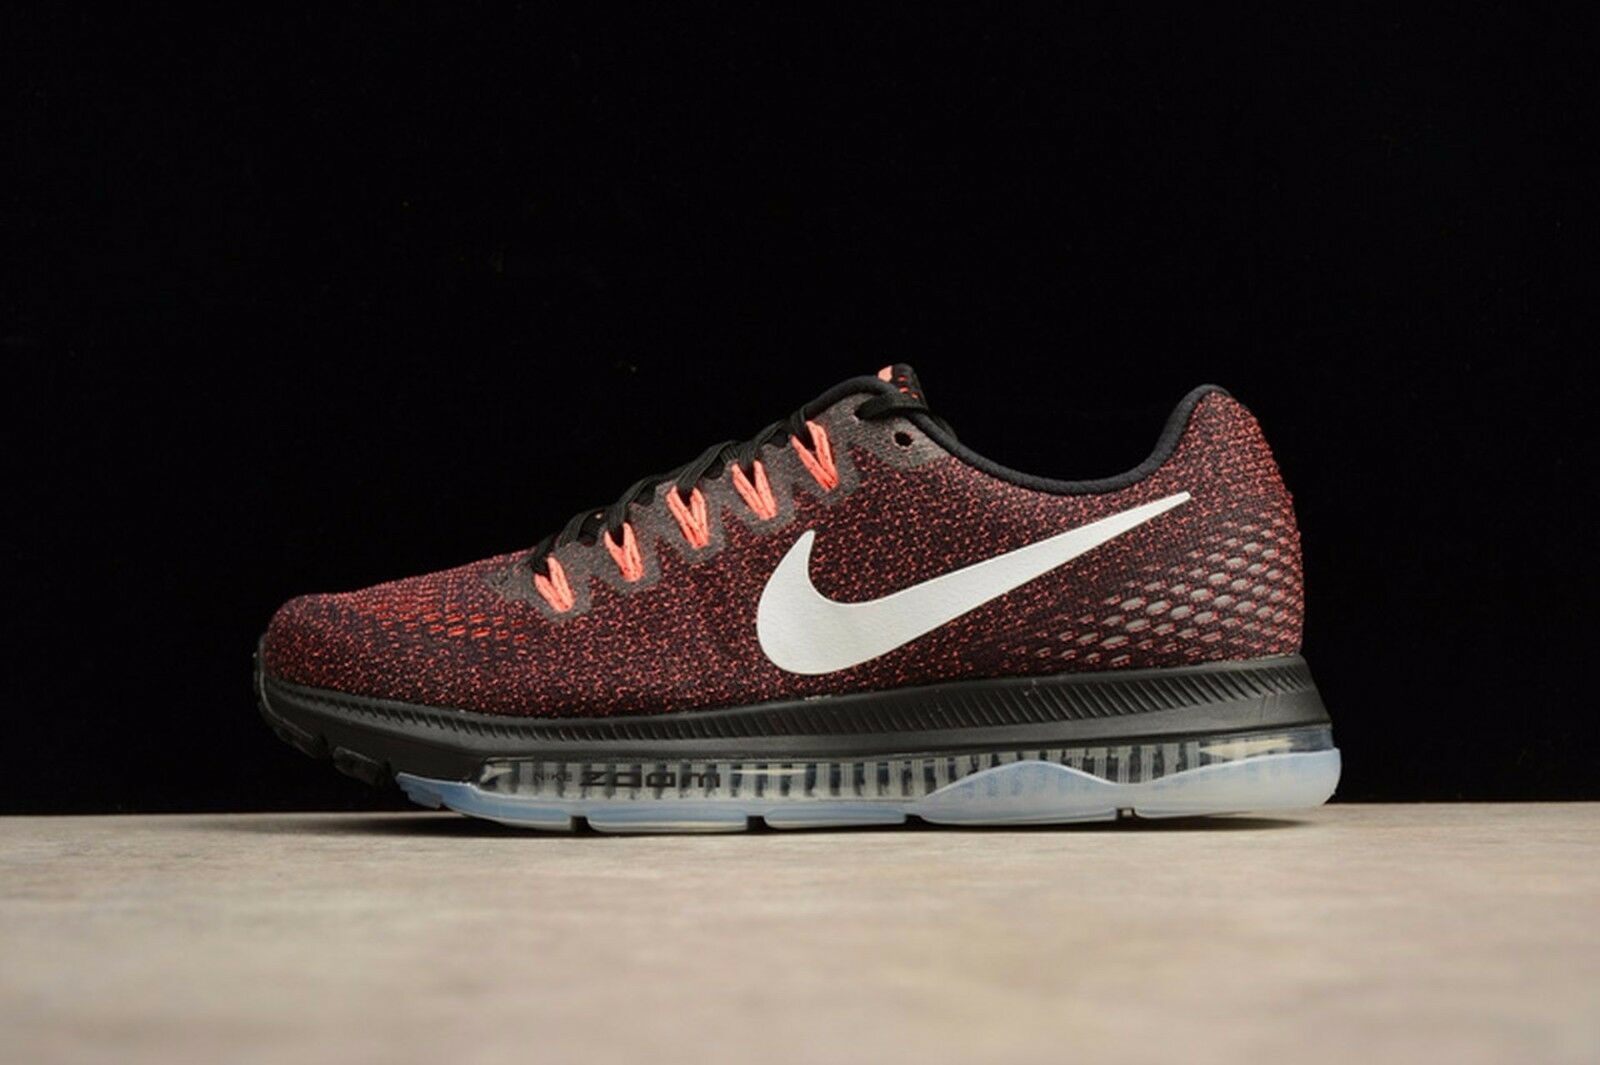 Nike Zoom All Out Low Black/White/Lava Glow Wmn Sz 9 878671 002